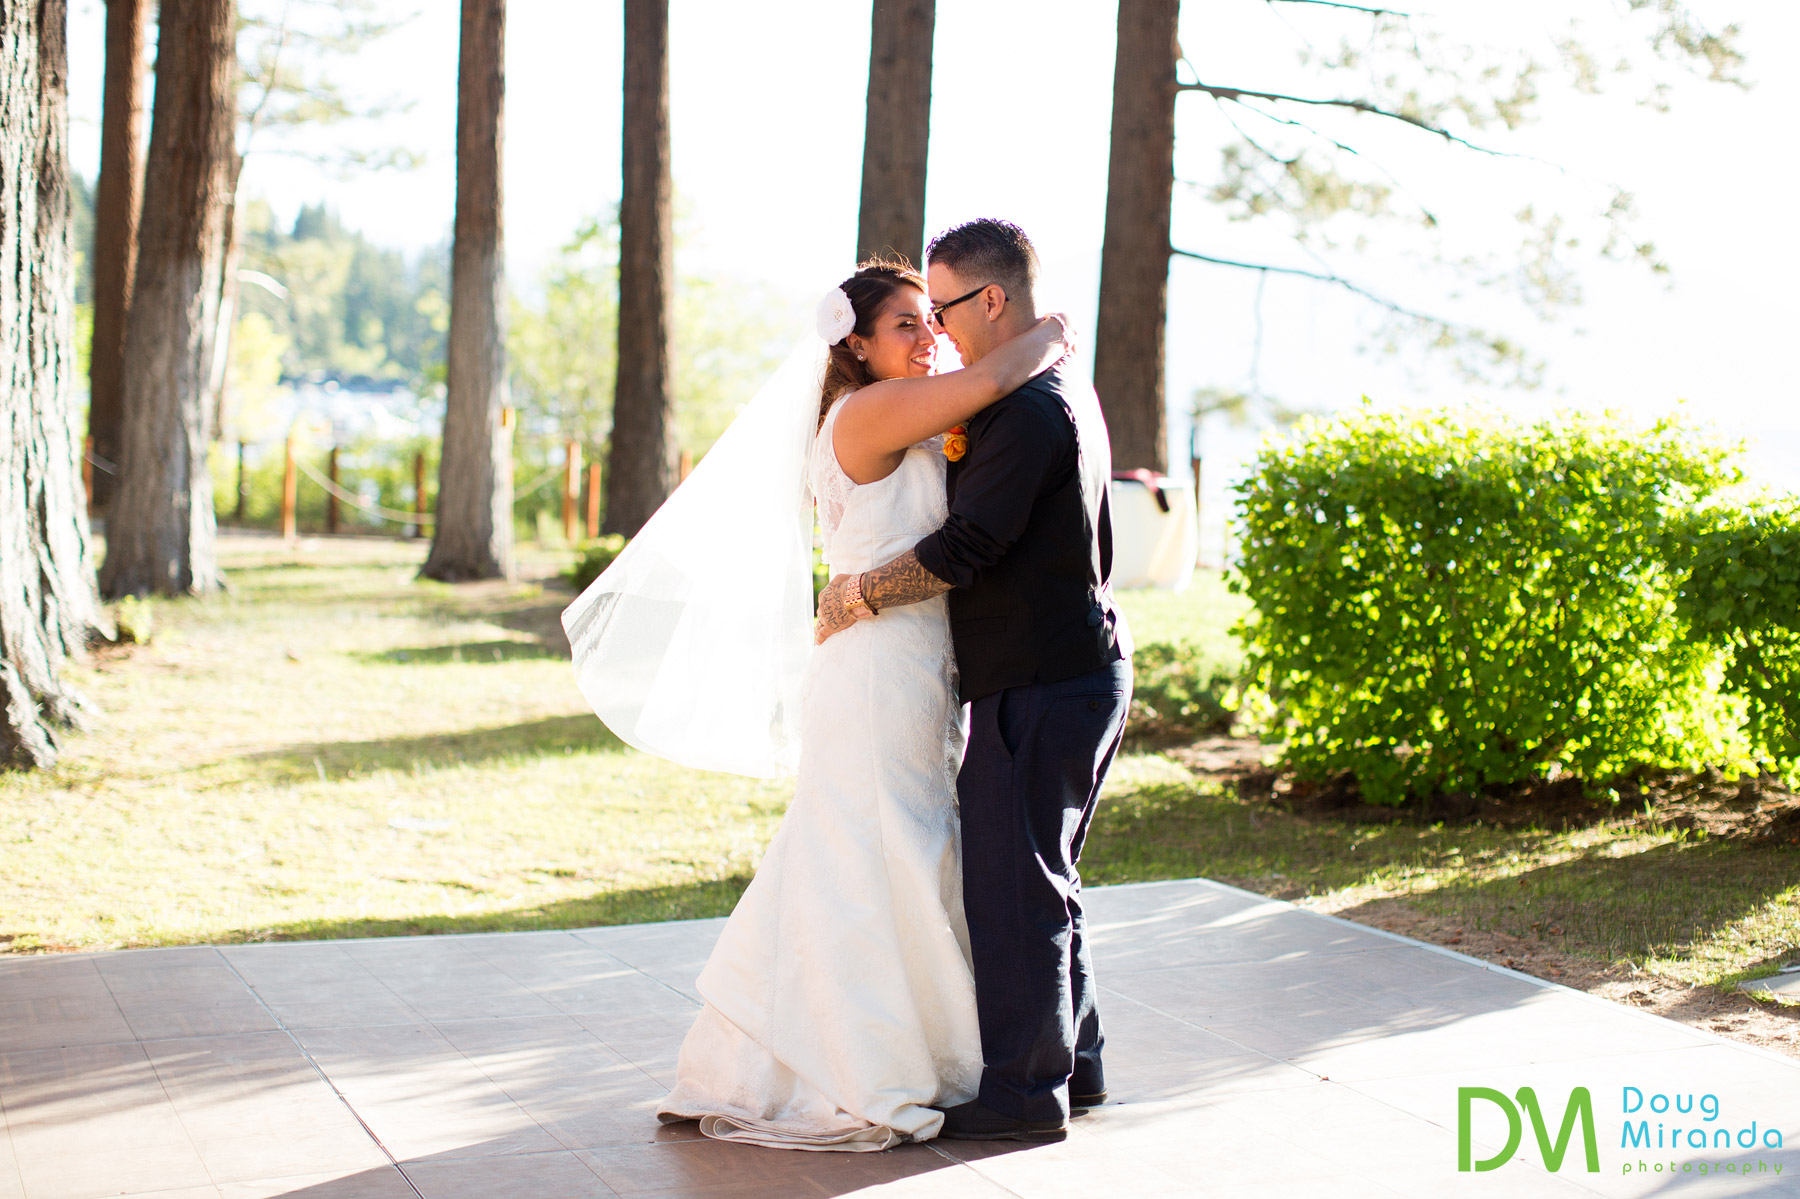 zephyr cove resort wedding photography